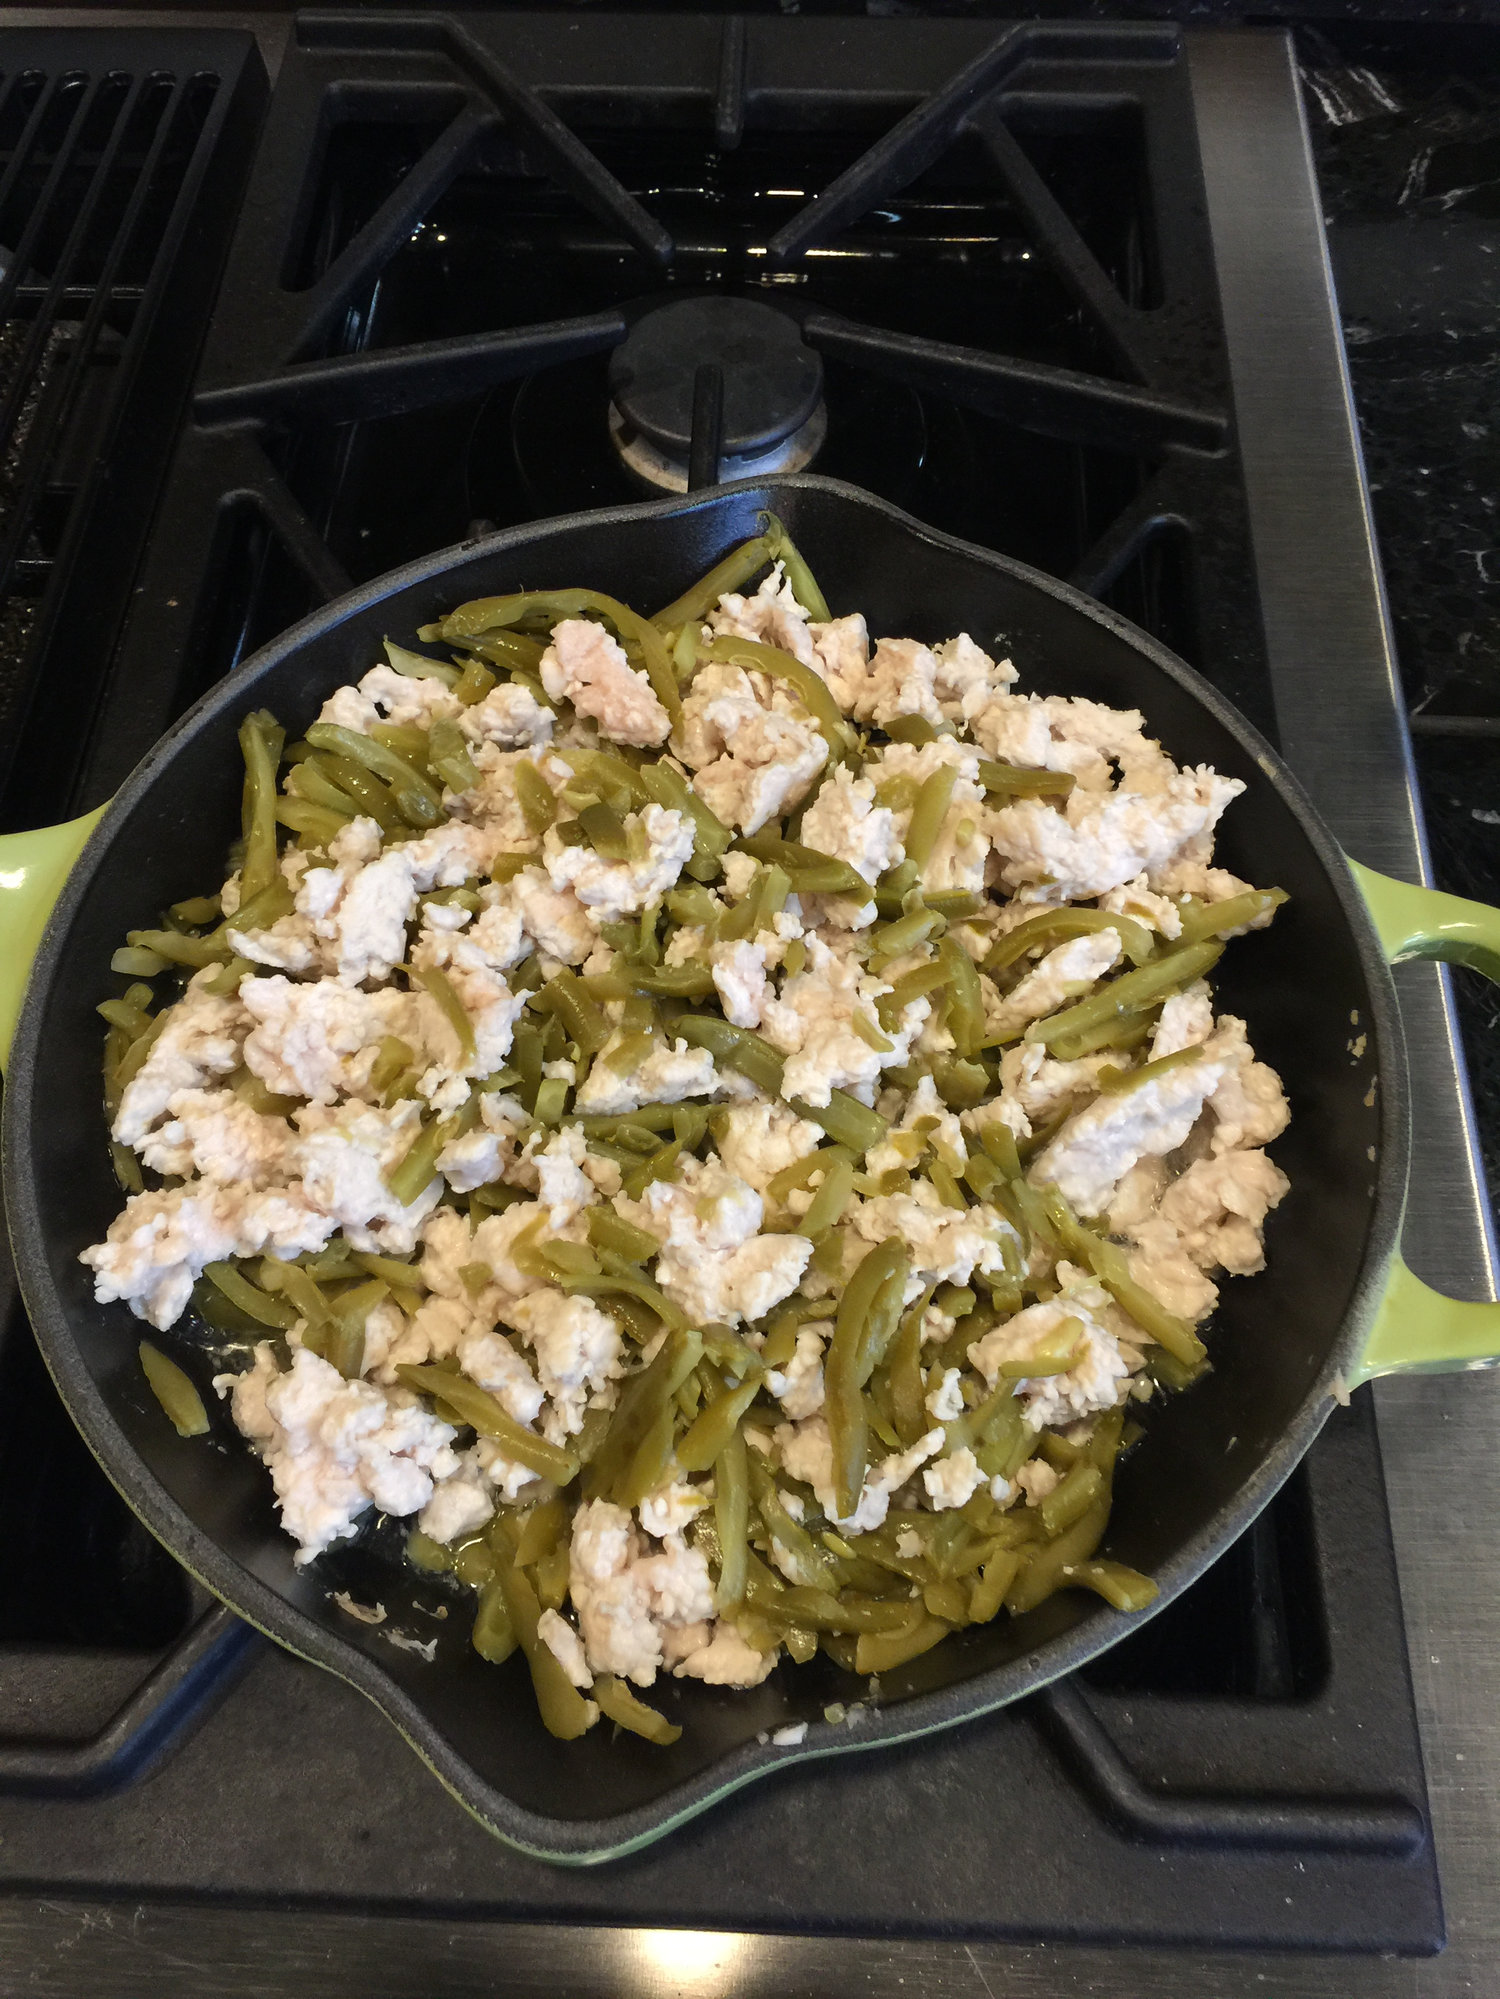 OT - Homemade dog food — Big Green Egg